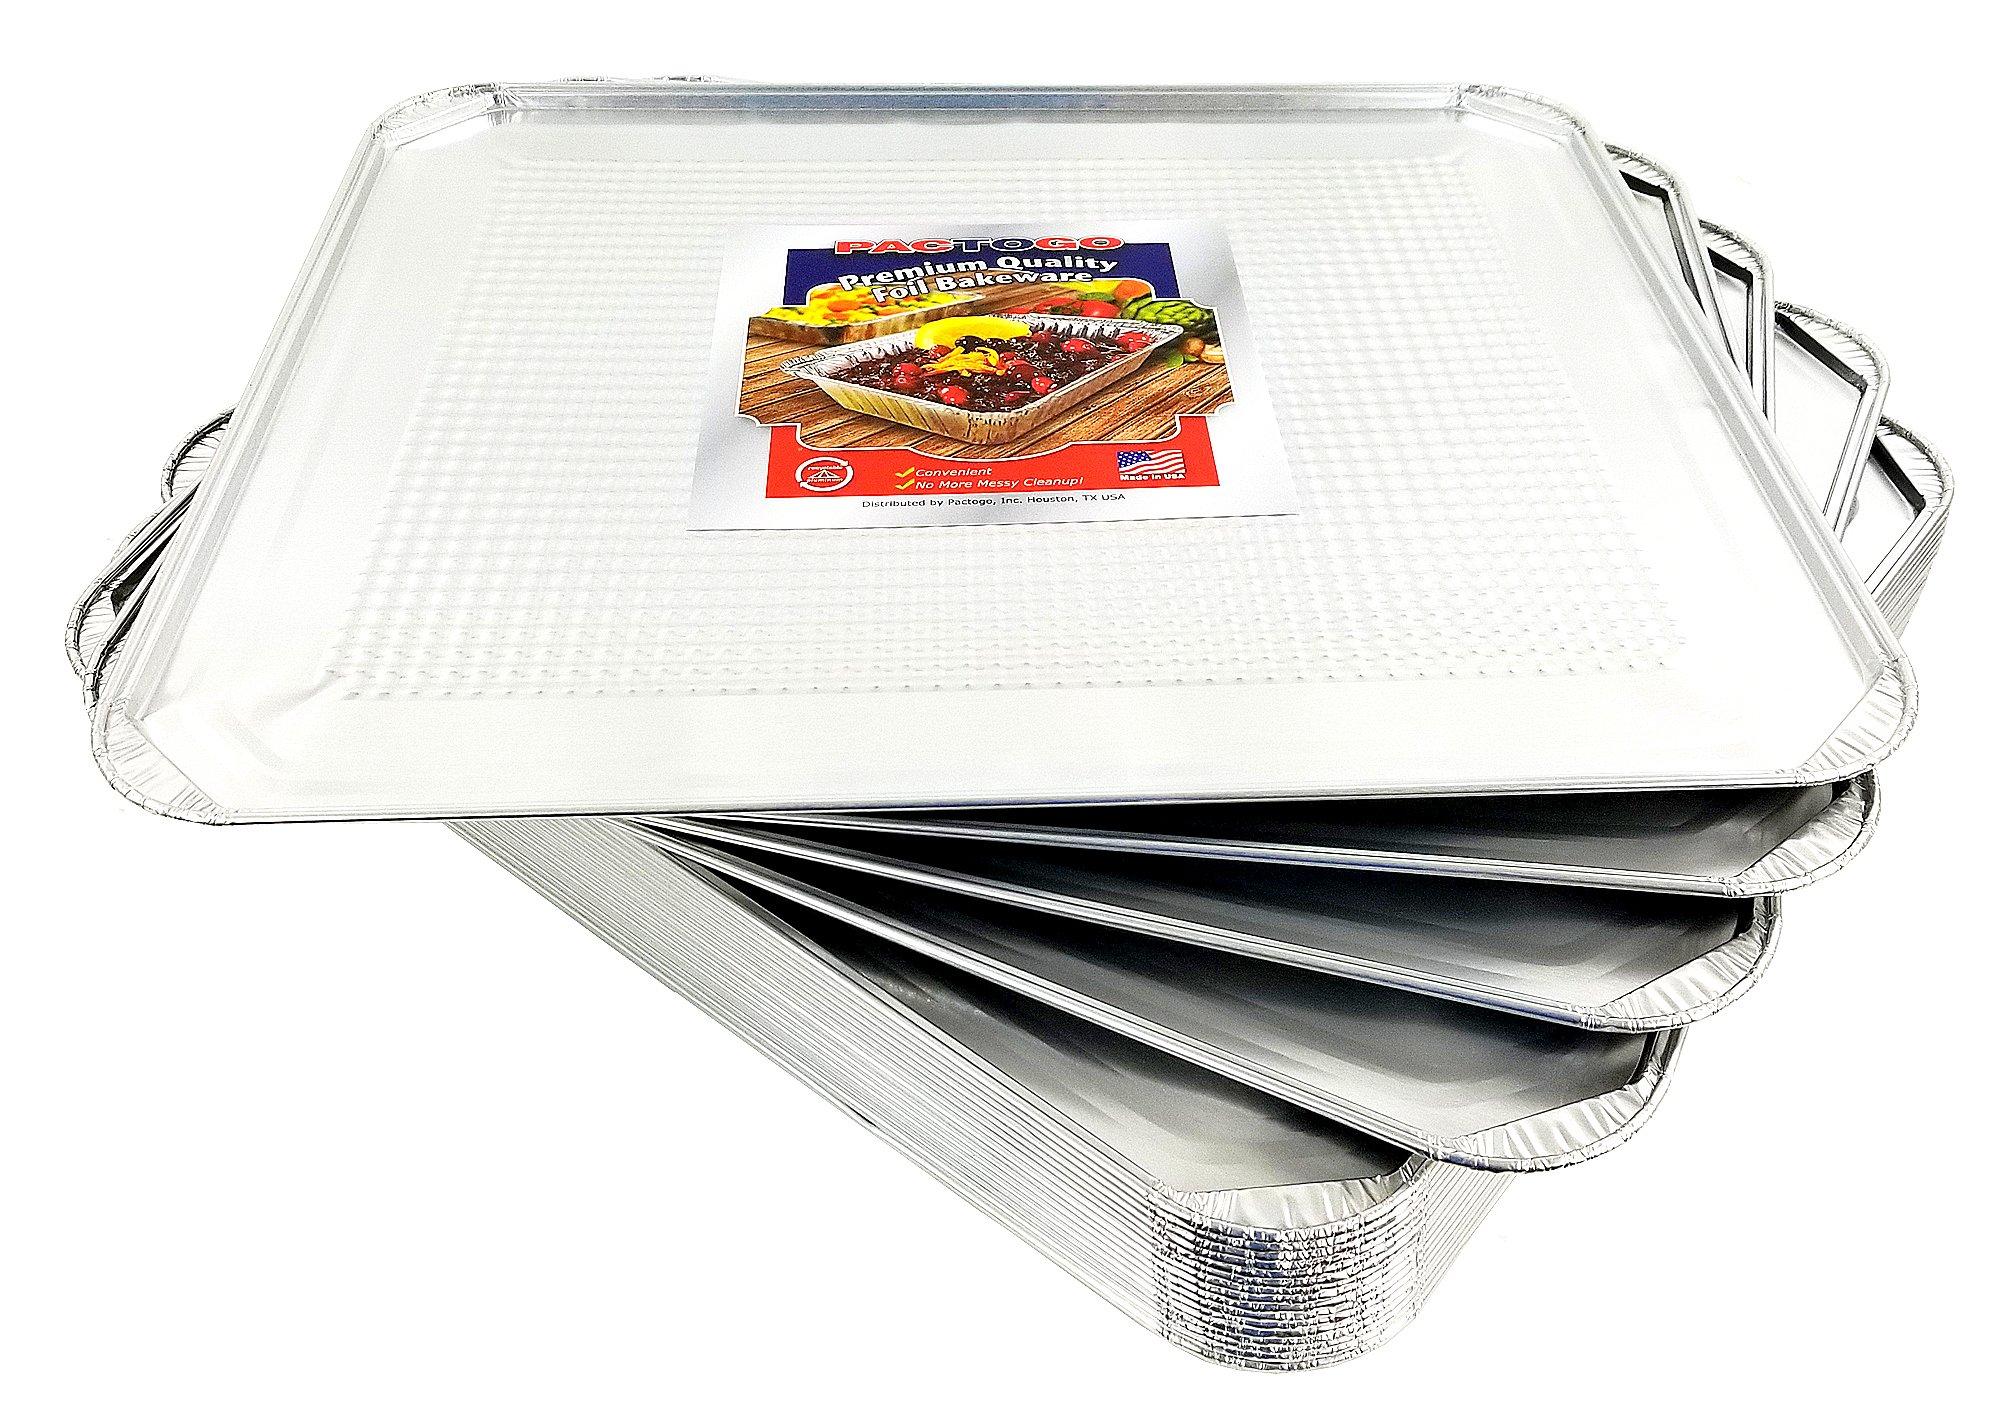 Pactogo Aluminum Foil Oven Liner Sheet Pan 20/Pk - 18'' x 15'' Disposable Sheets (Pack of 20)